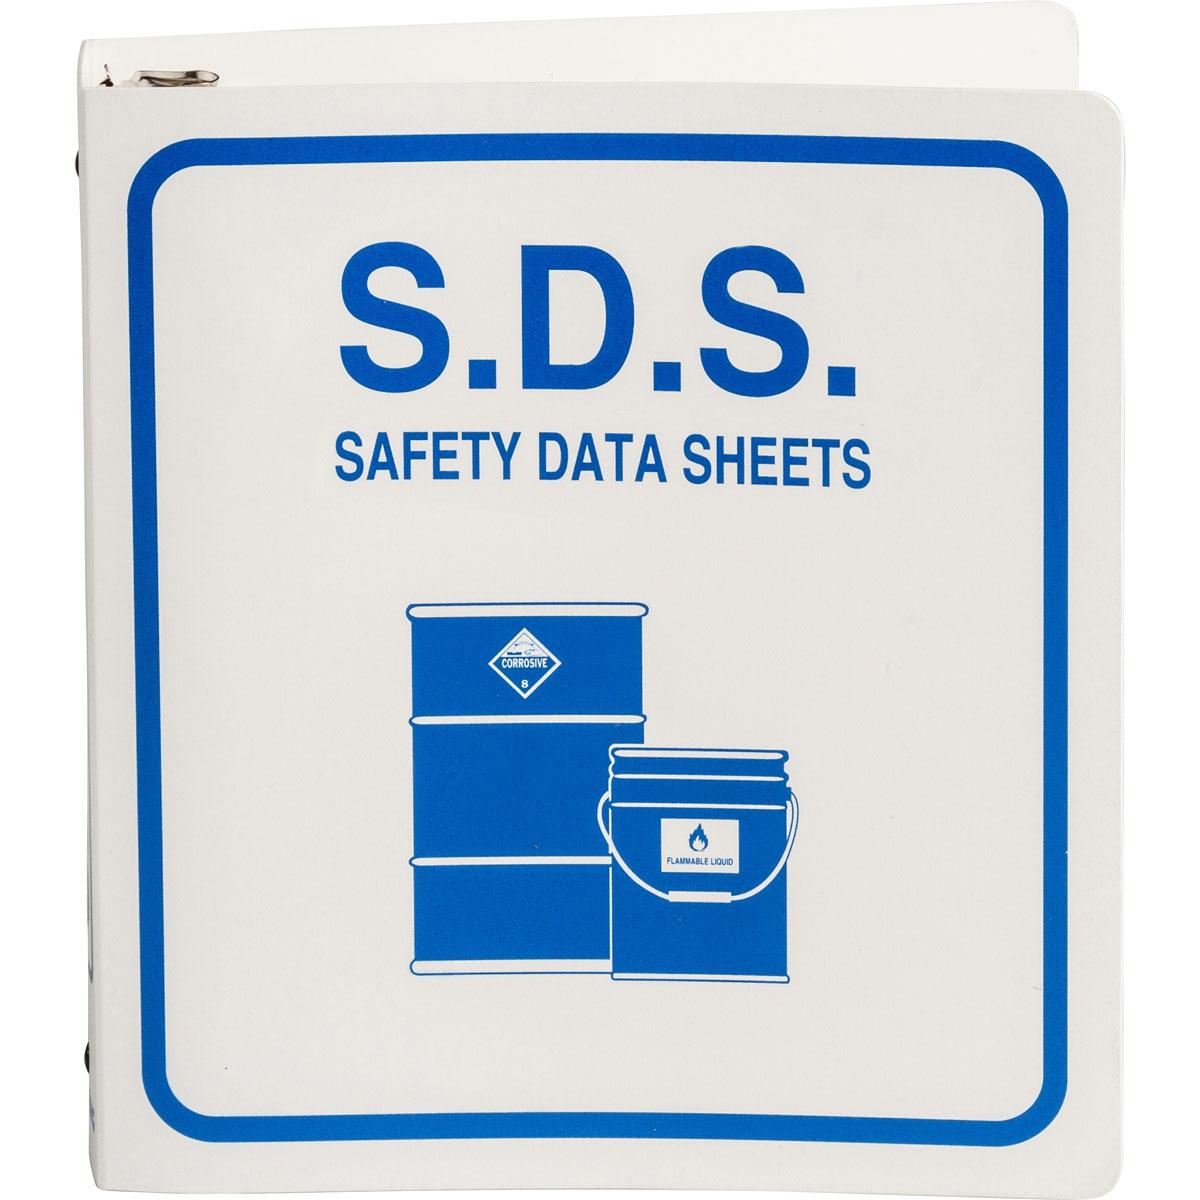 MSDS Binder for Meeting OSHA Guidelines